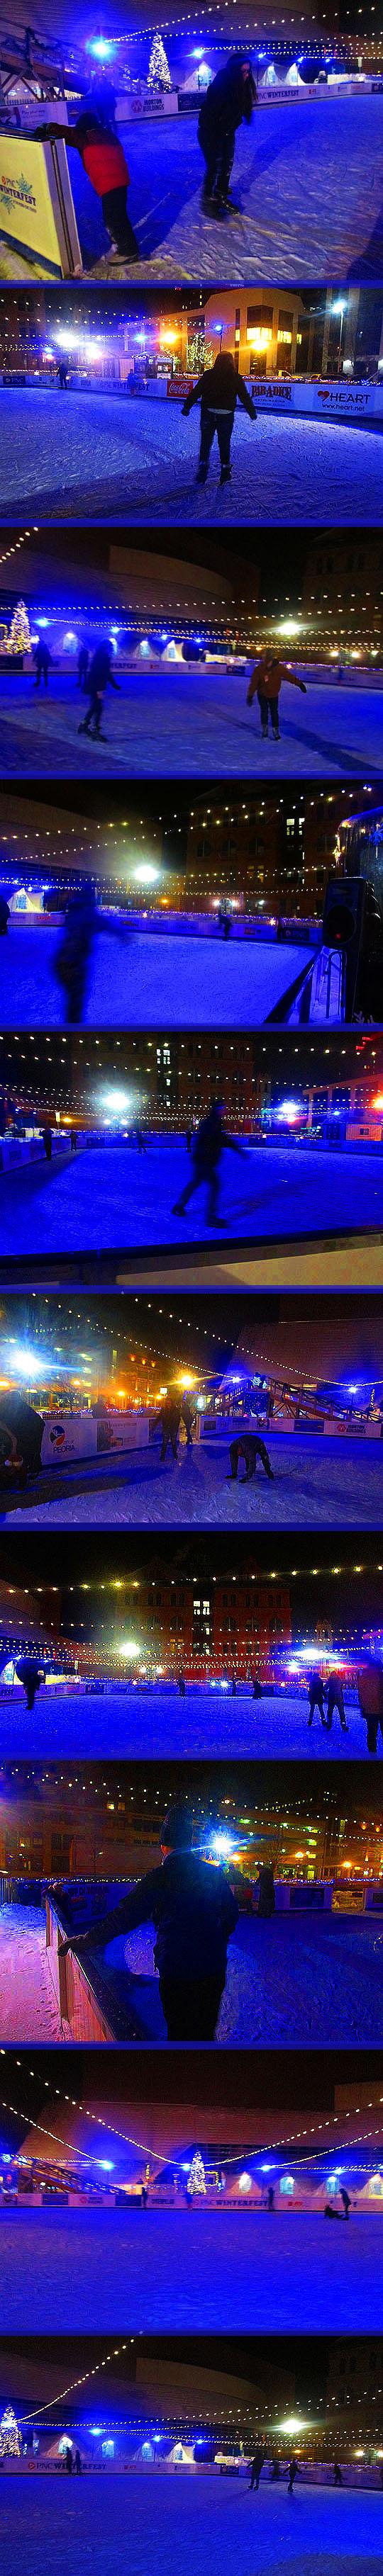 6. skaters_jan3-17.jpg